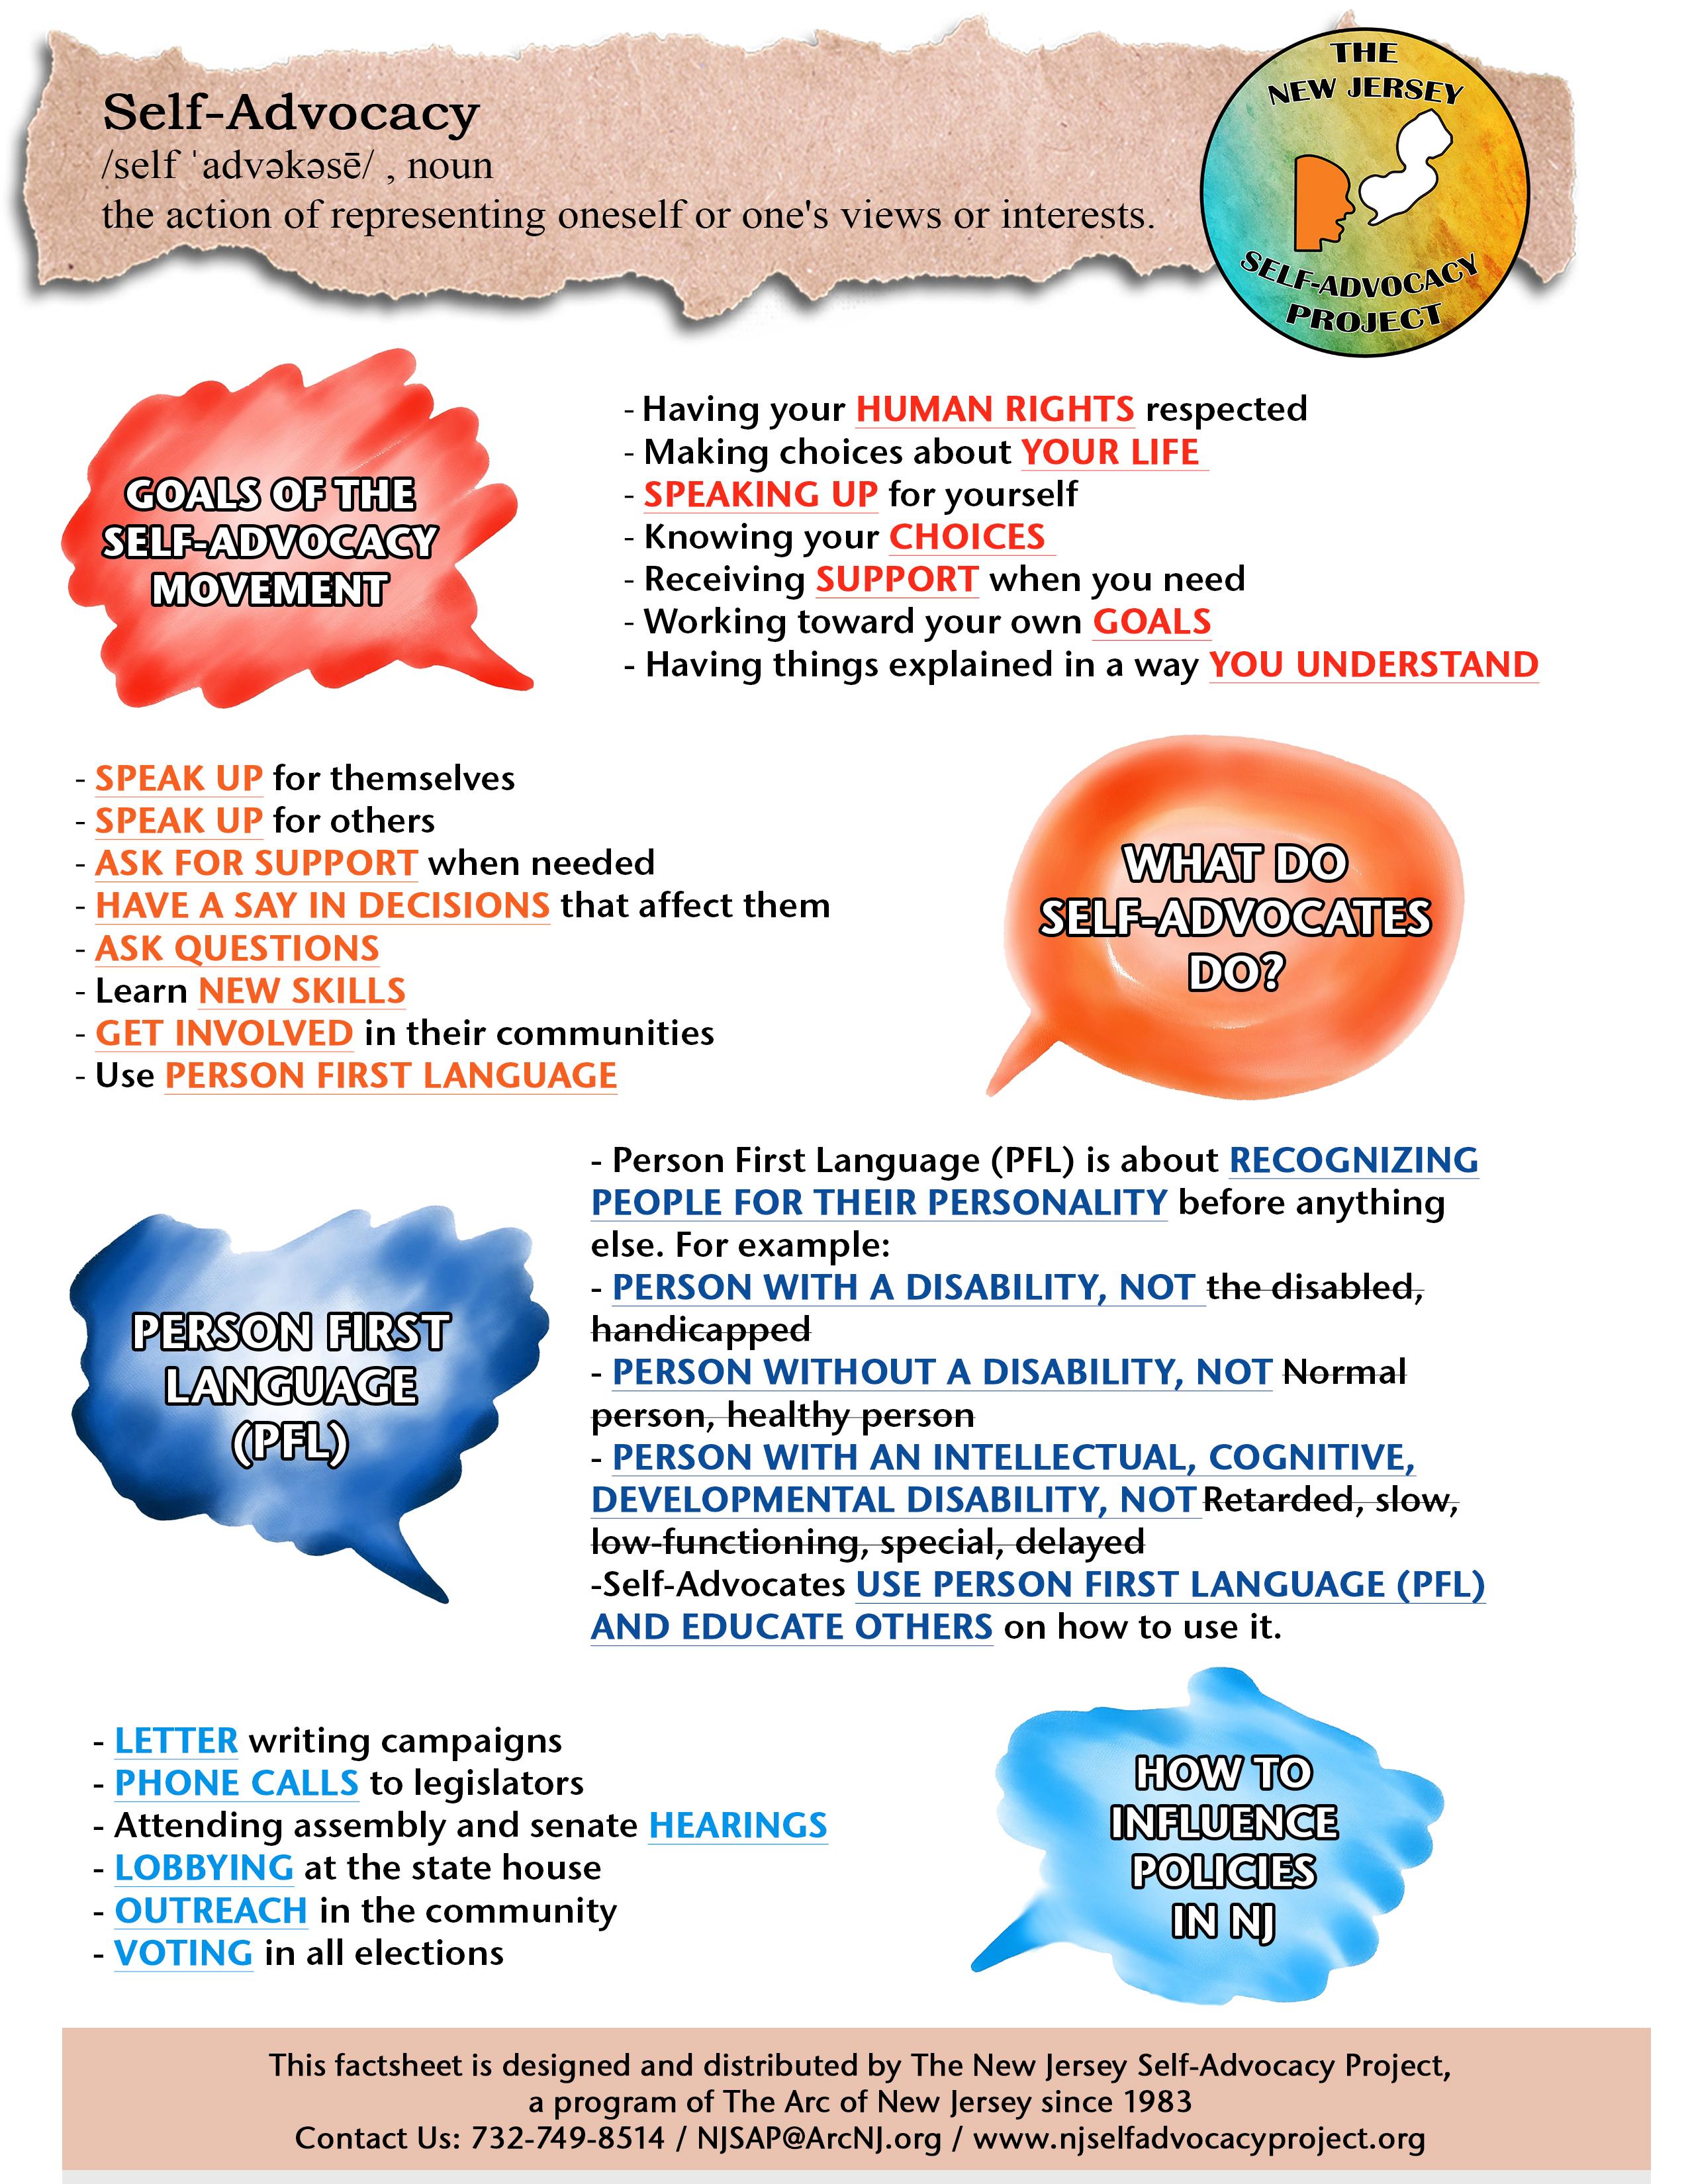 Self-Advocacy Factsheet